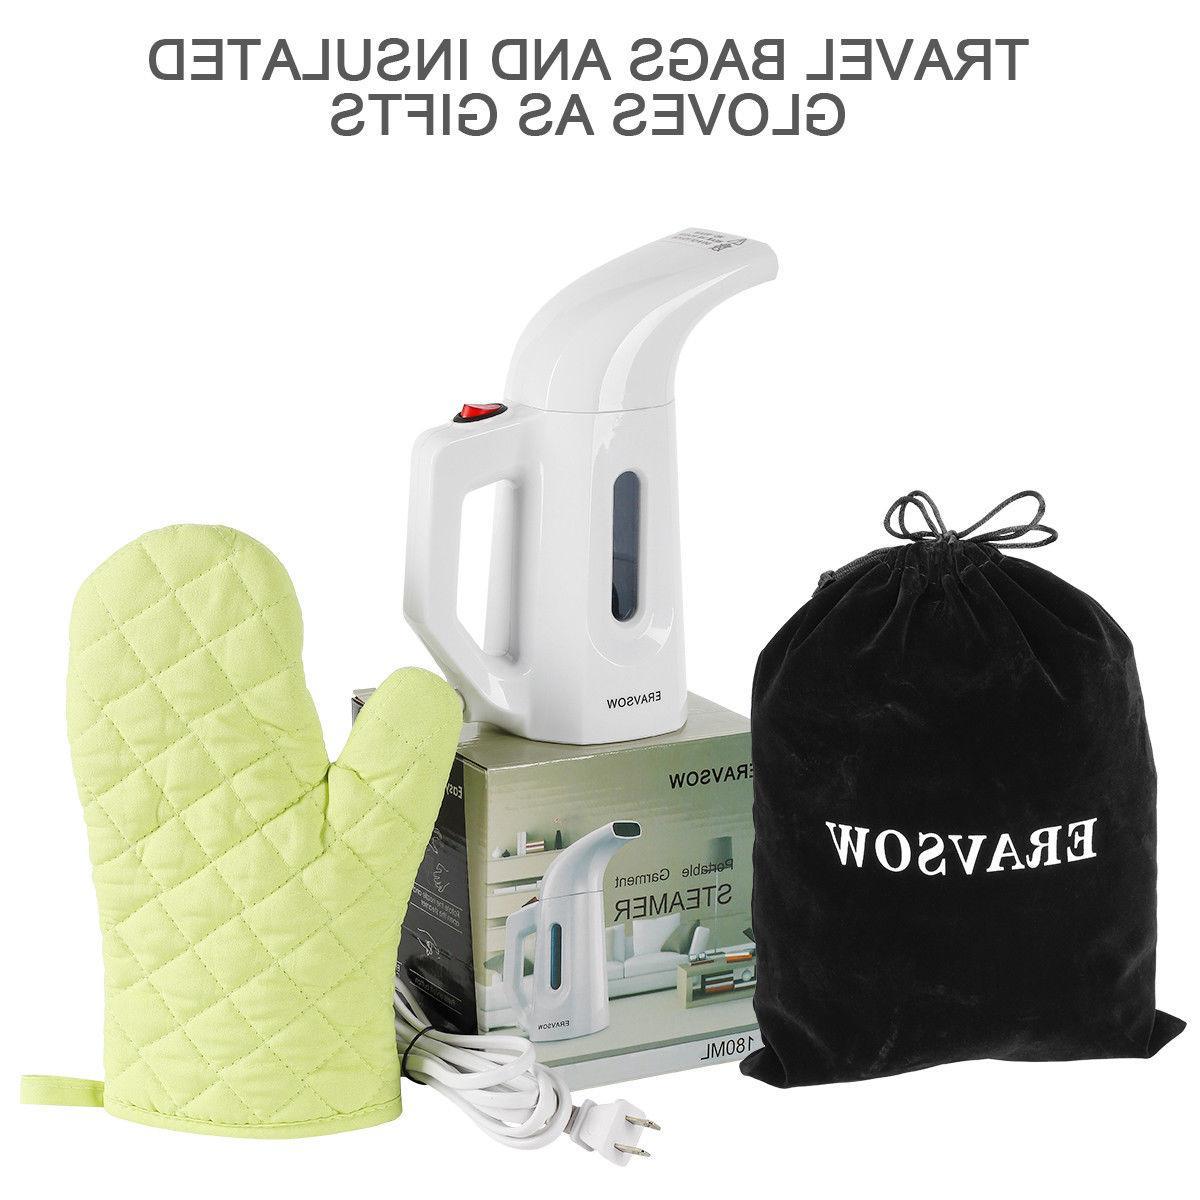 Portable Steamer Fabric Travel/Home 180ml